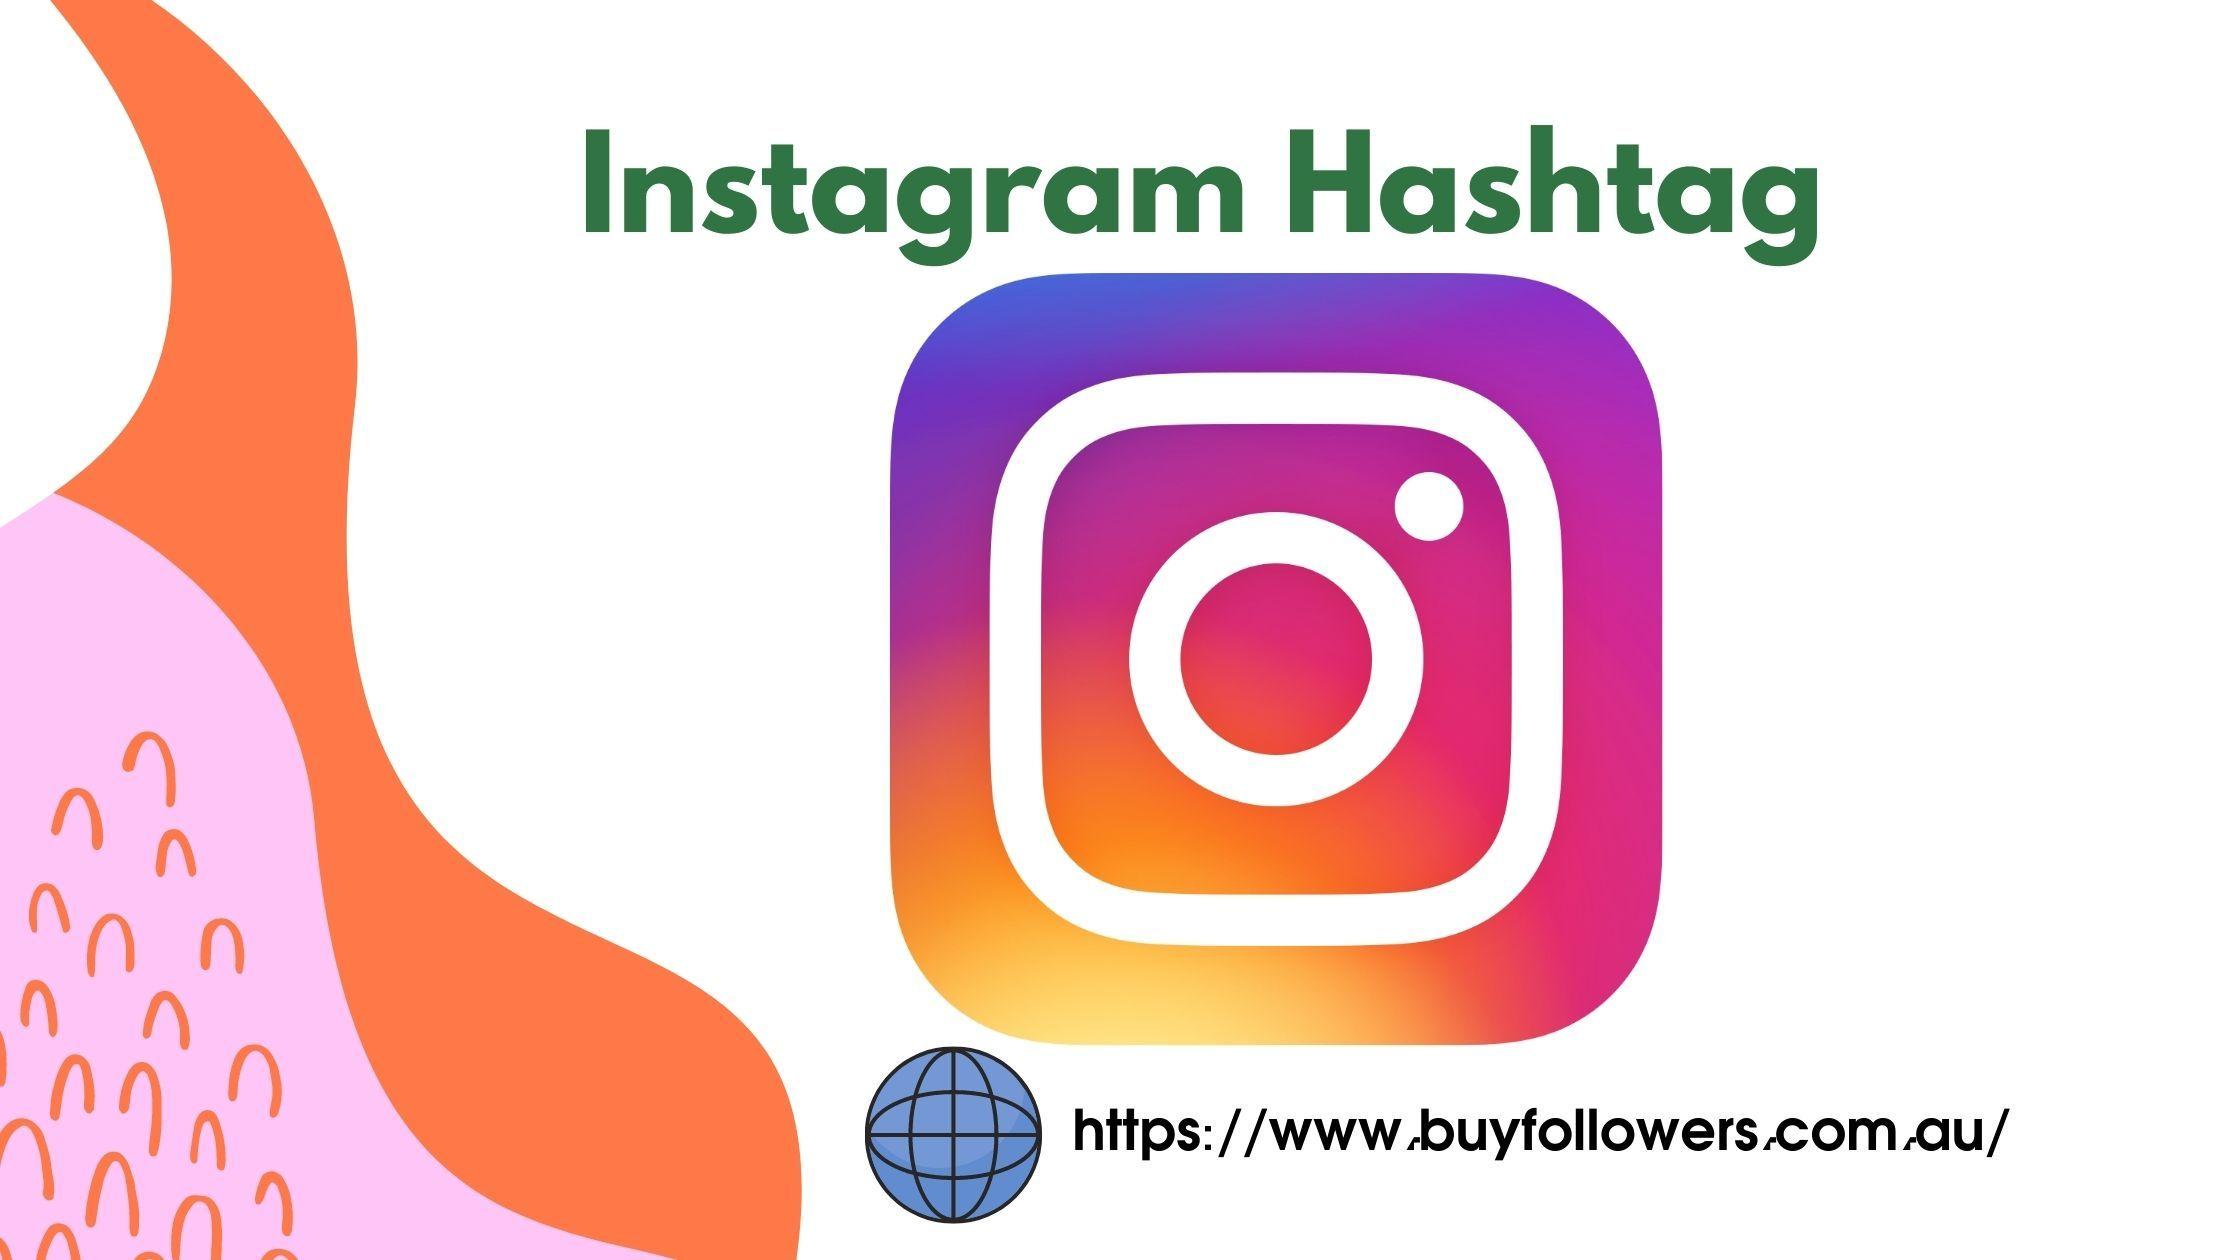 Buy Instagram Followers Australia & Likes Fast Delivery - BuyFollowers | Buy  instagram followers, Instagram followers, Instagram